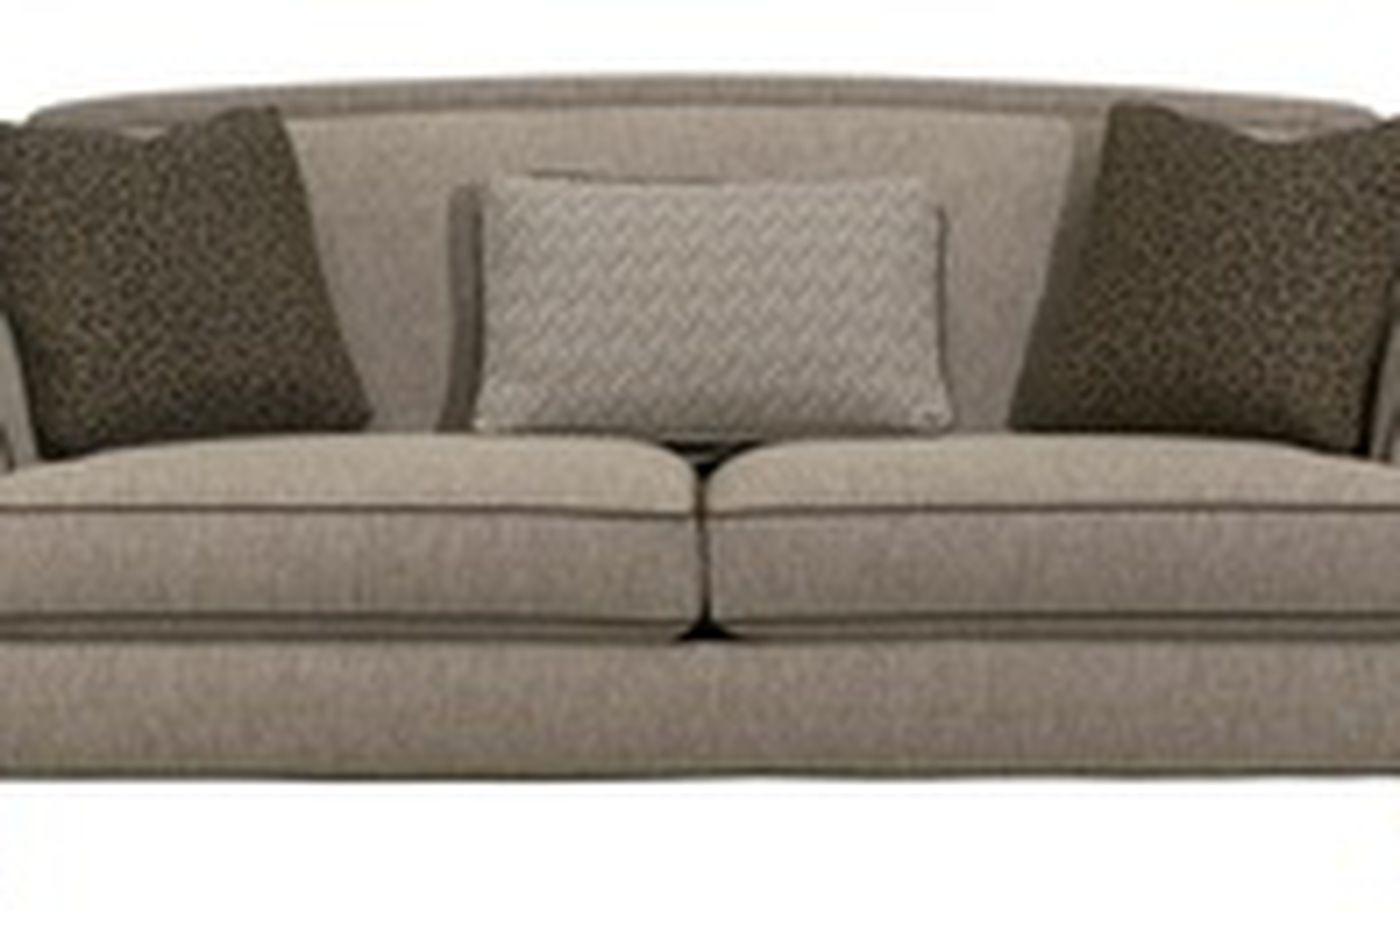 Ask Jennifer Adams: How to make a sofa I hate work